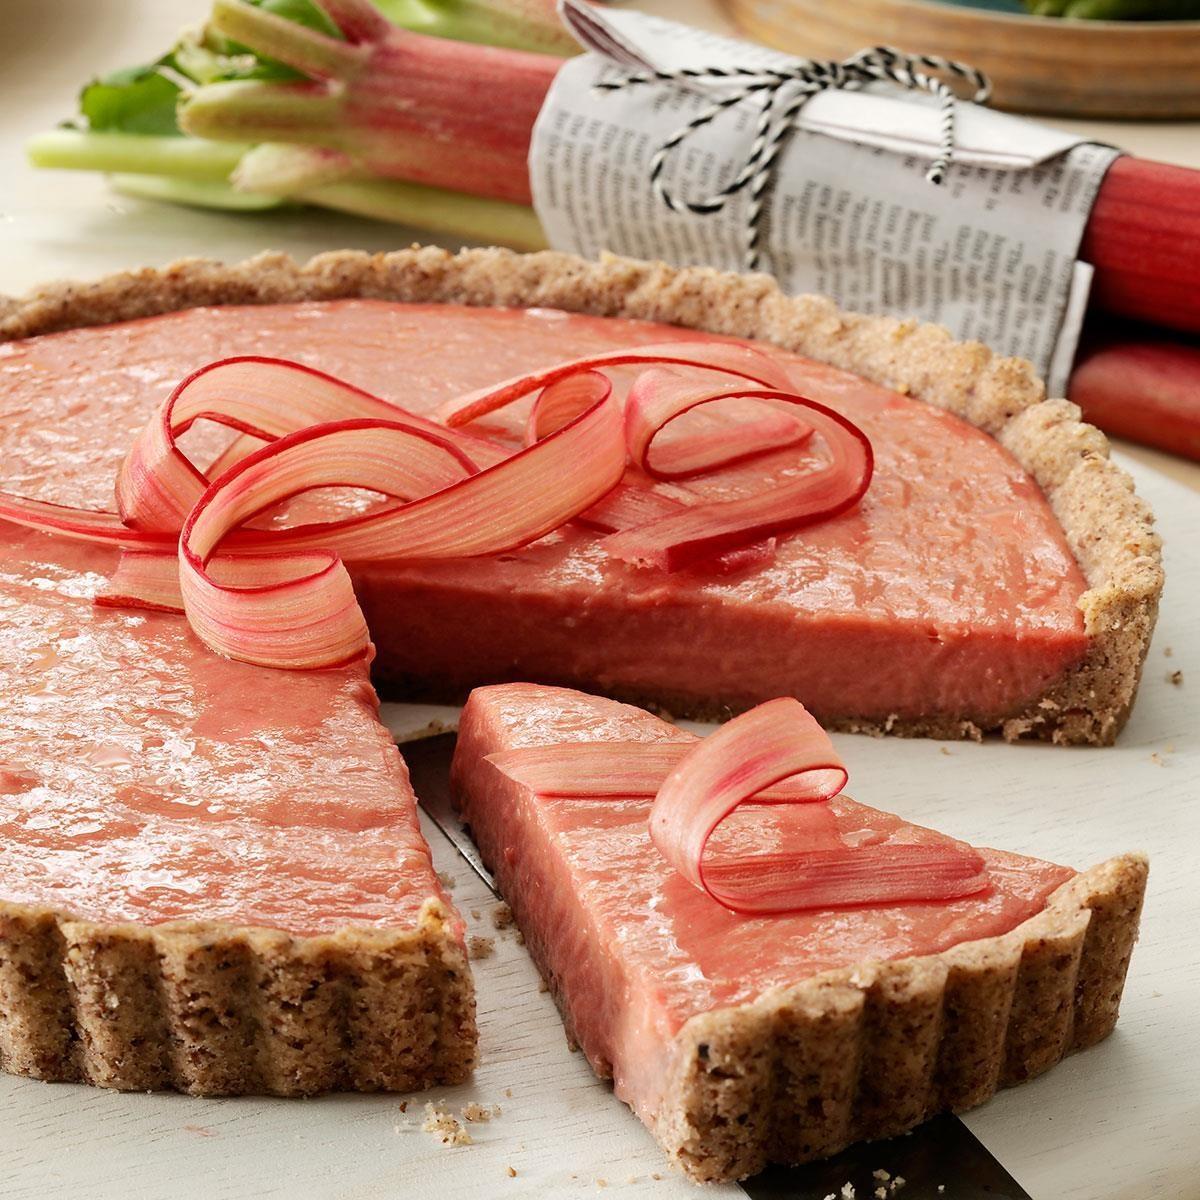 Rhubarb Tart With Shortbread Crust Exps160800 Hca2379809c05 23 3bc Rms 1